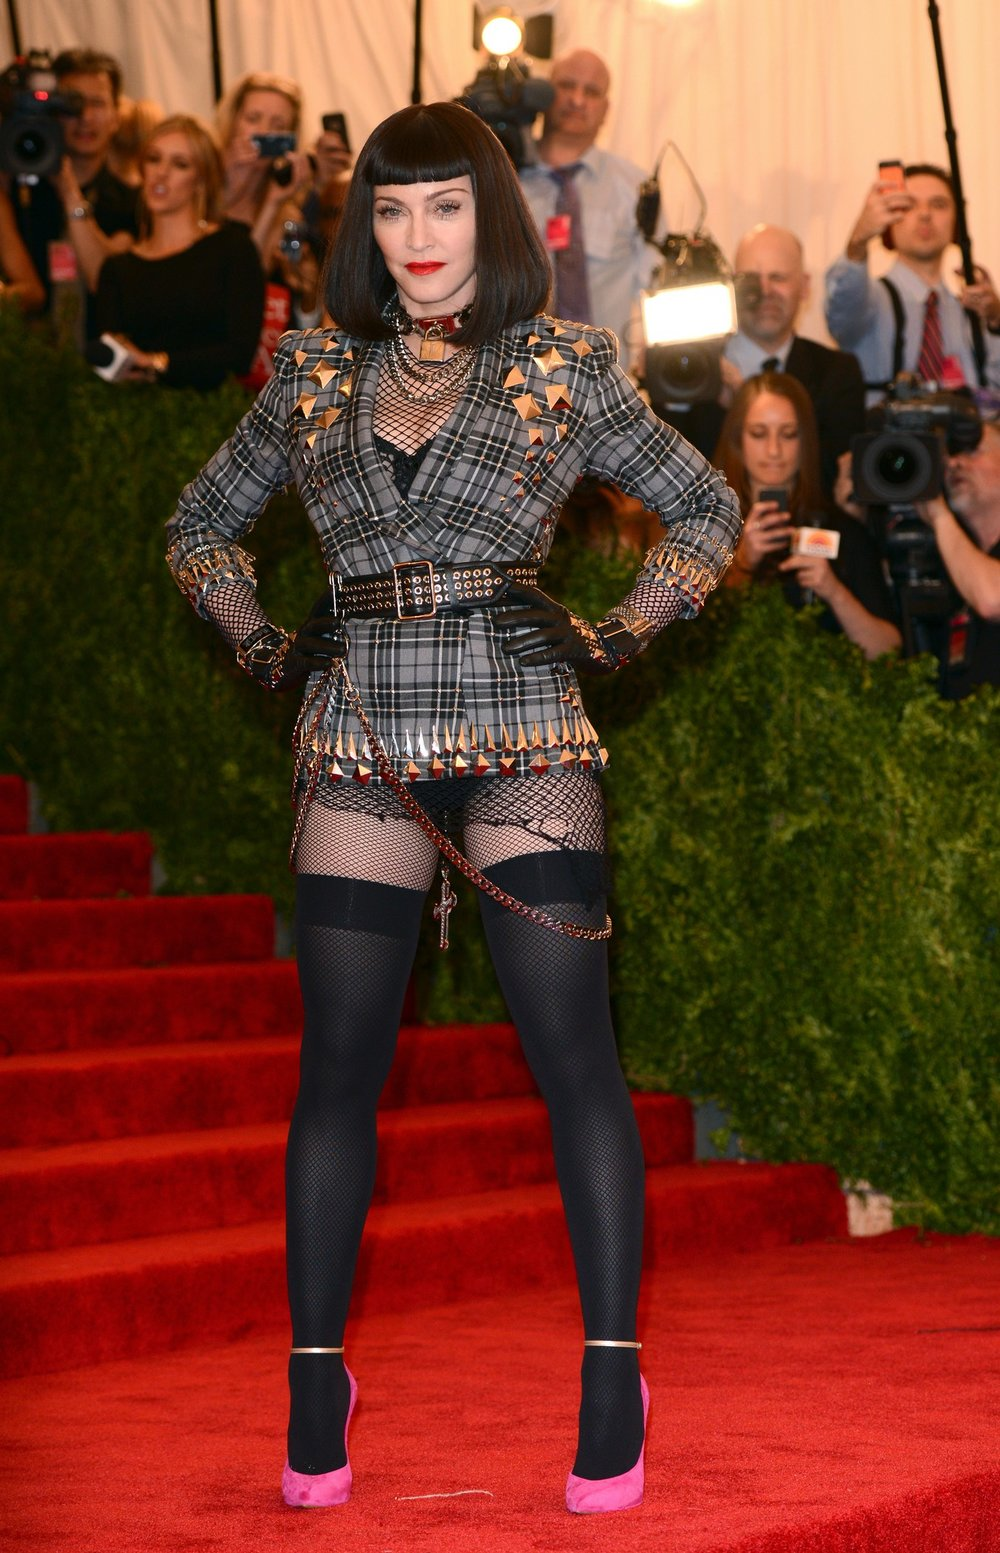 Madonna Givenchy 2013.jpg